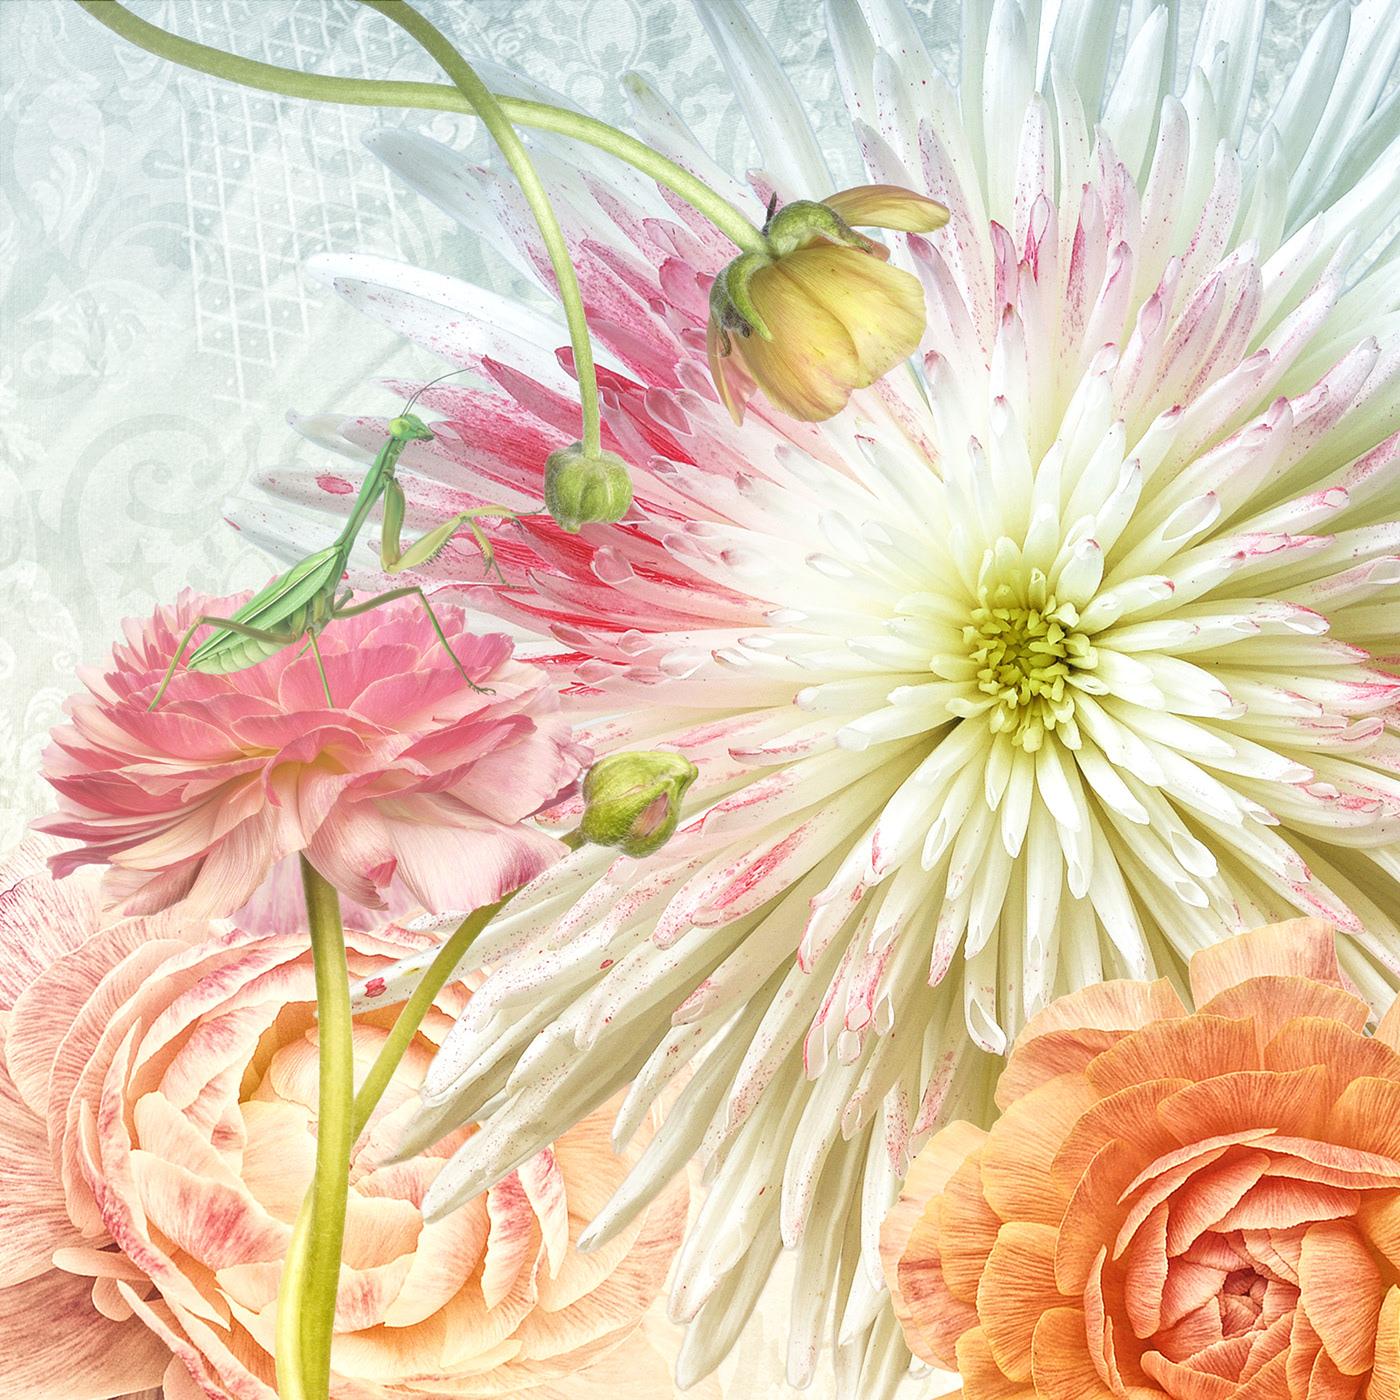 Flower Poetry/ фотограф Bettina Güber